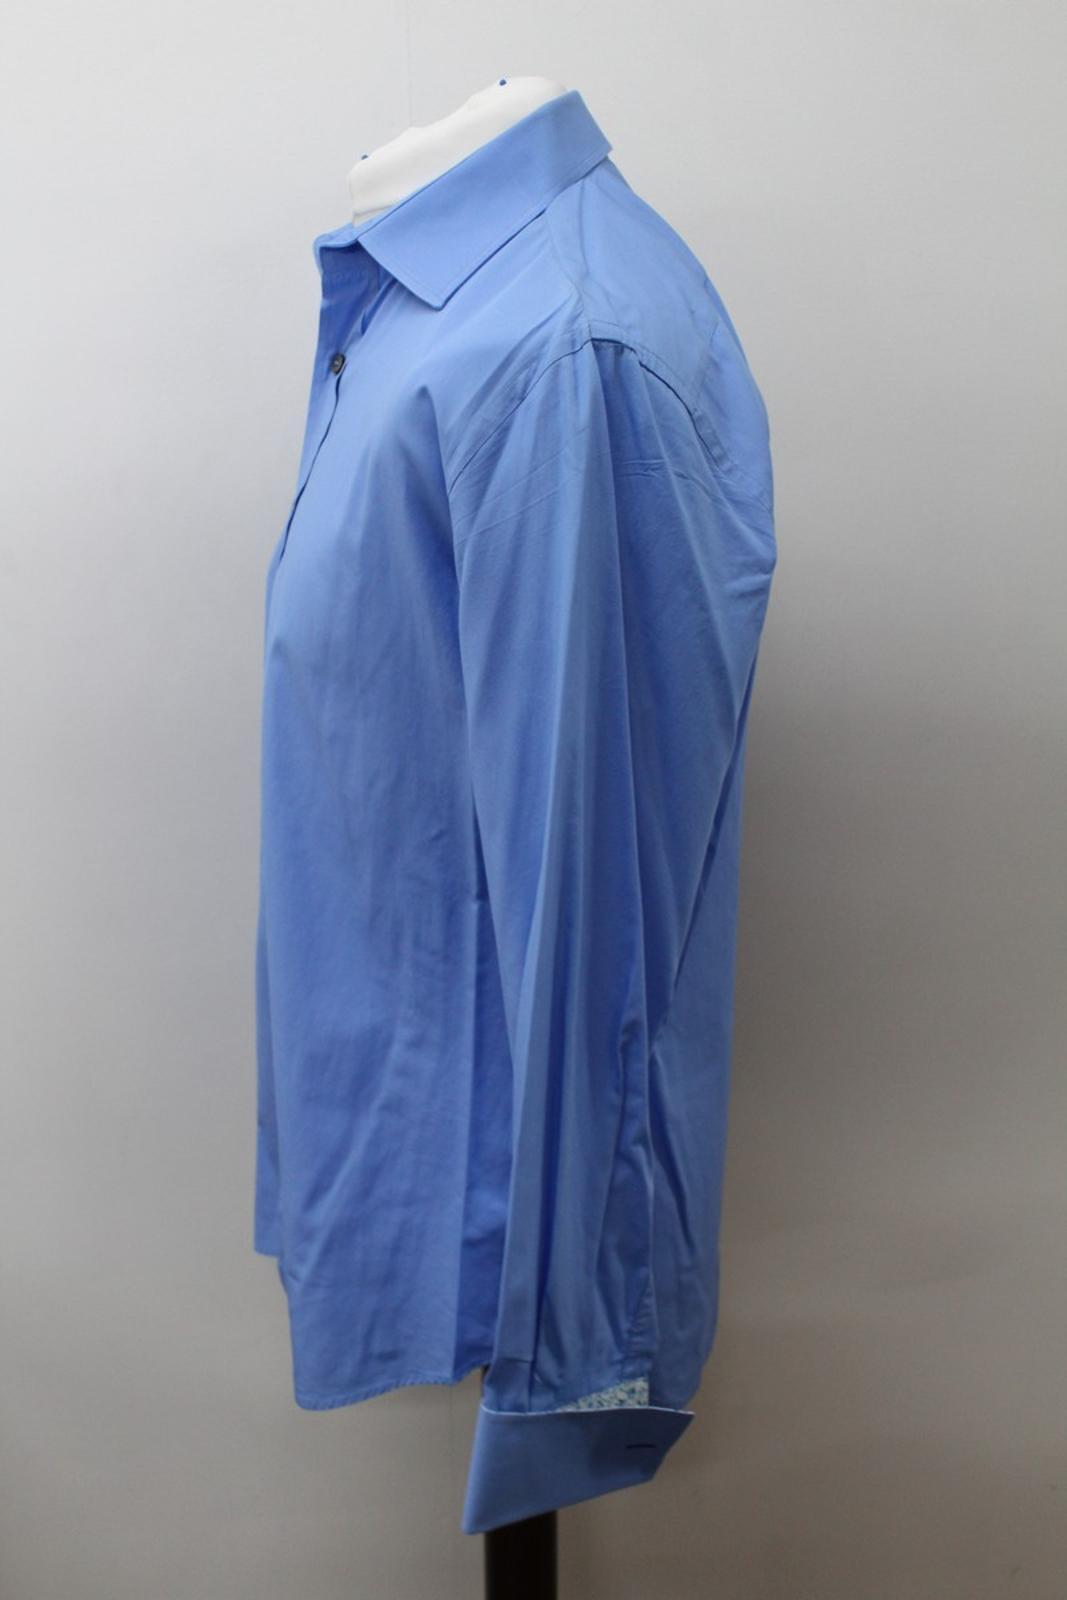 Paul-Smith-Hombres-Azul-Algodon-Mangas-Largas-Camisa-De-Puno-Doble-Cuello-16-5-034-42cm miniatura 6